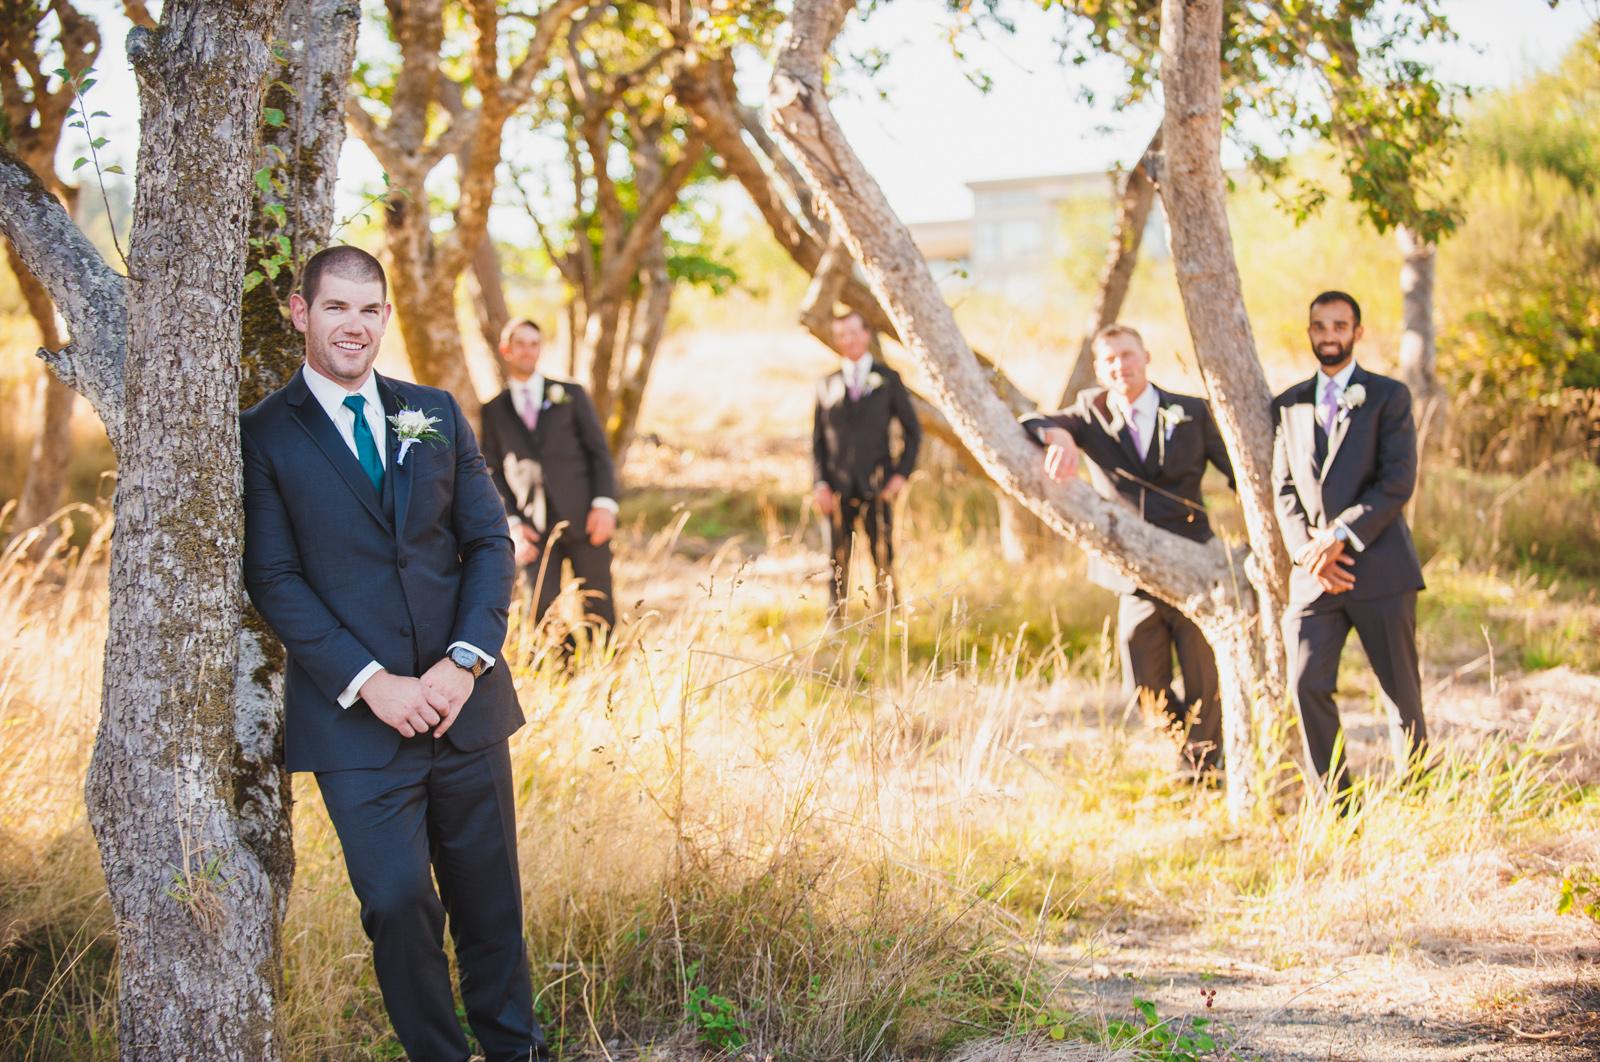 victoria-wedding-photographers-royal-colwood-golf-course-wedding-32.jpg